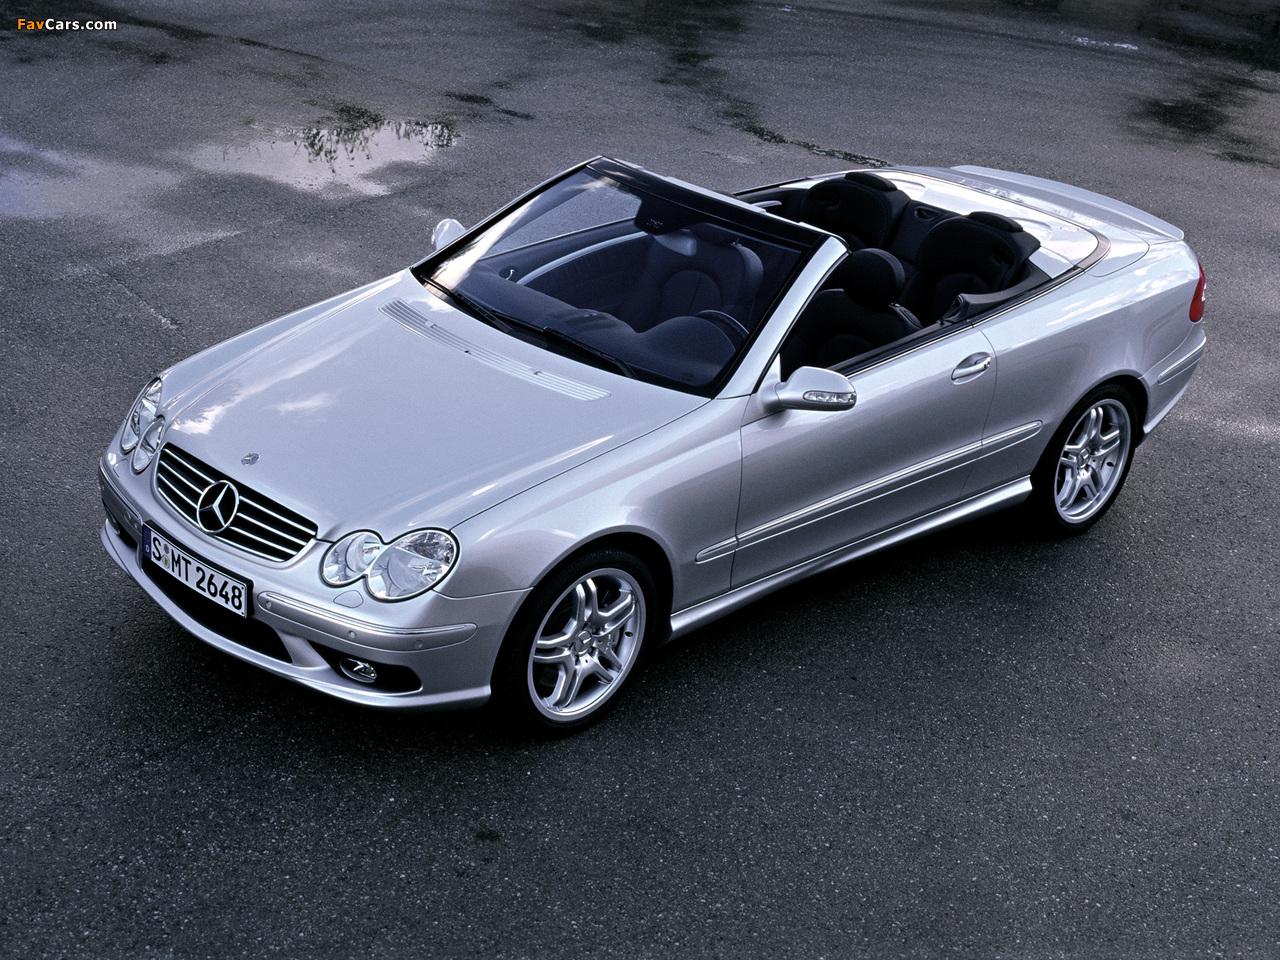 Mercedes-Benz CLK 55 AMG Cabrio (A209) 2003–05 images (1280 x 960)